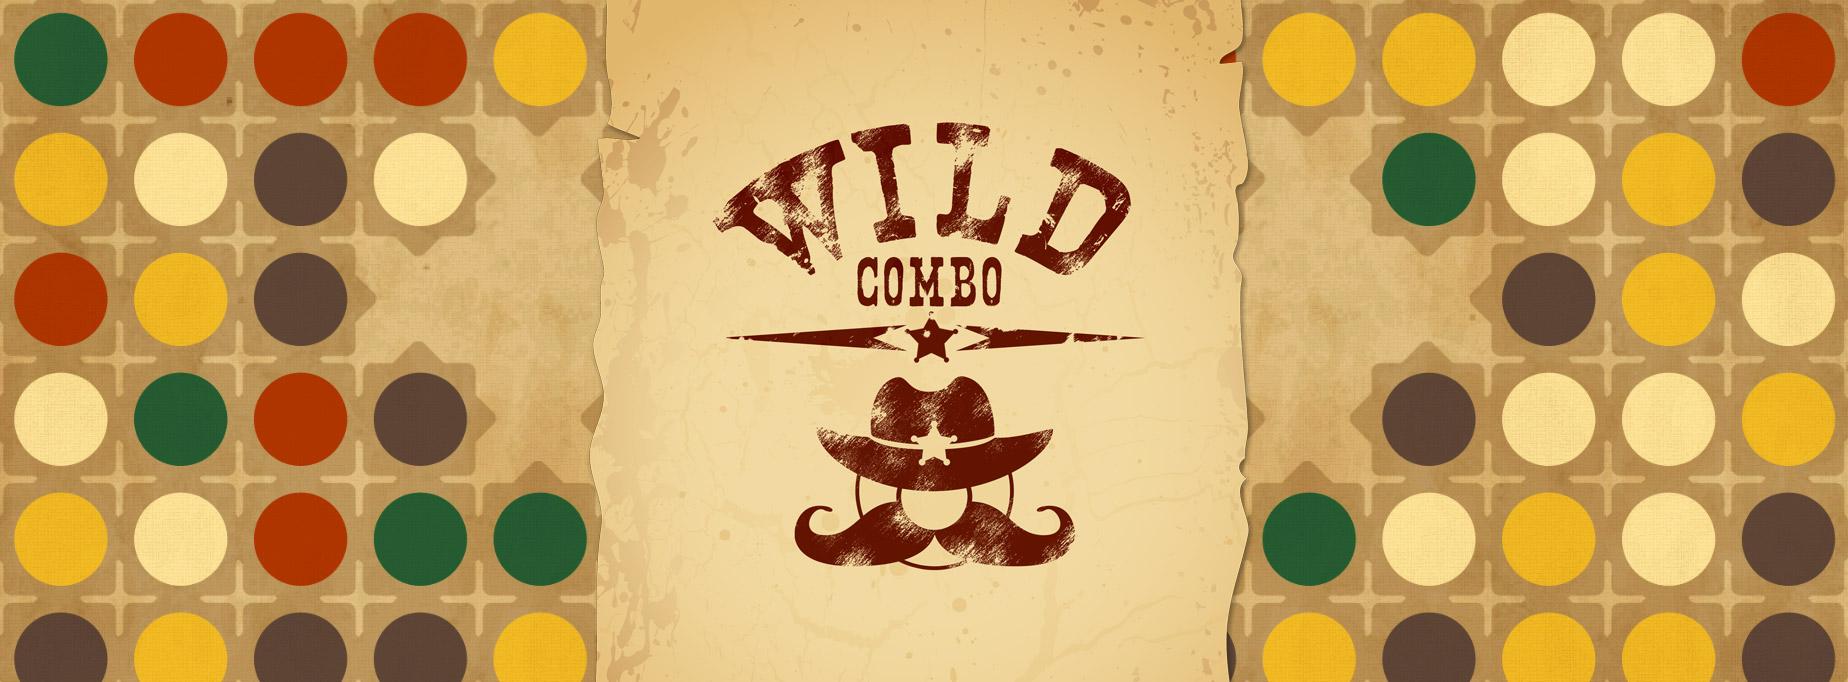 wild combo color match puzzle